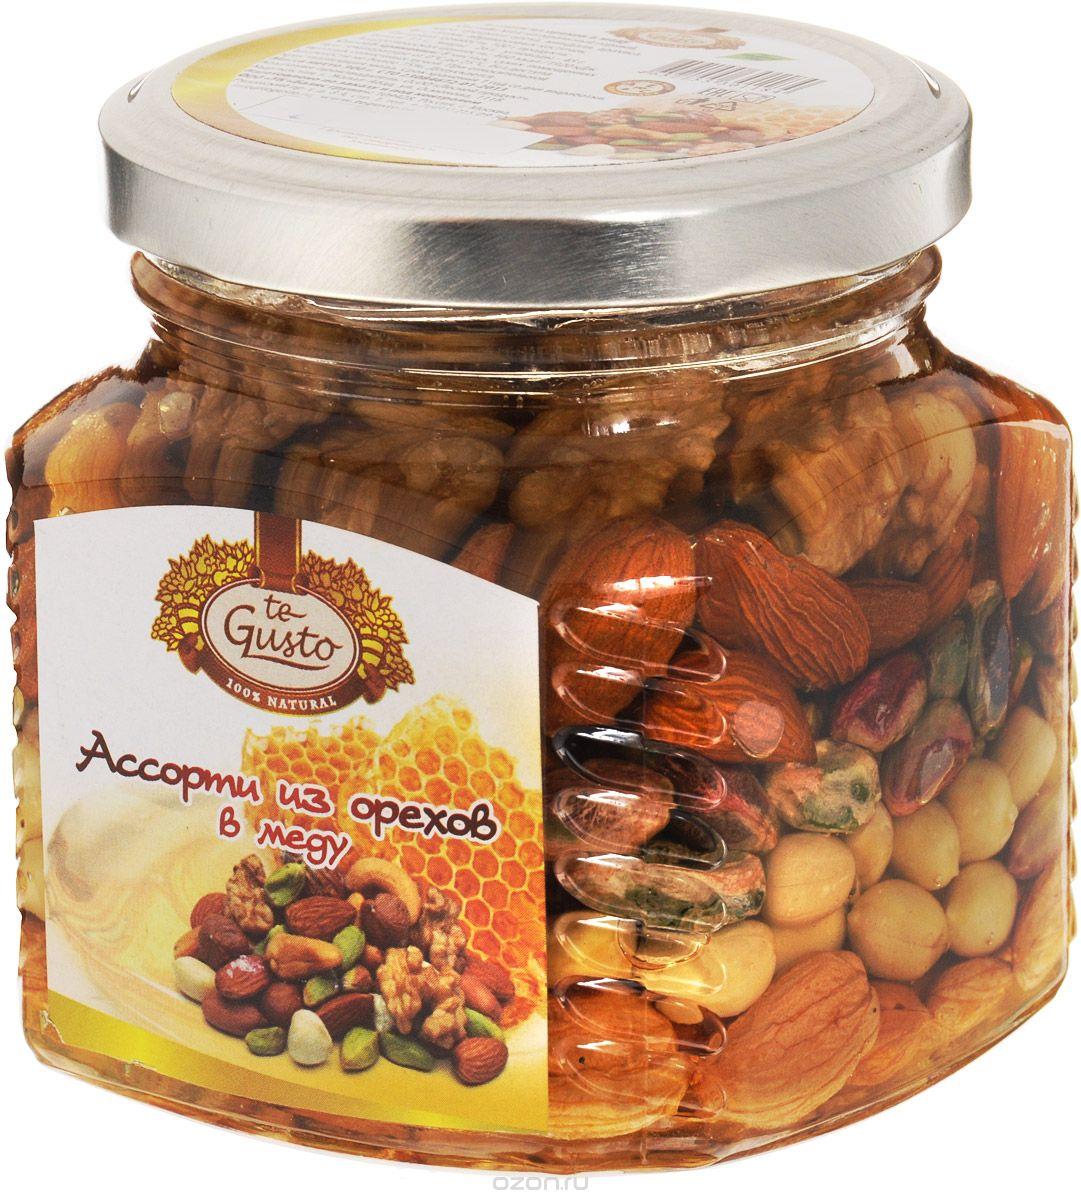 te Gusto Ассорти из орехов в меду, 300 г te gusto грецкие орехи в меду 300 г